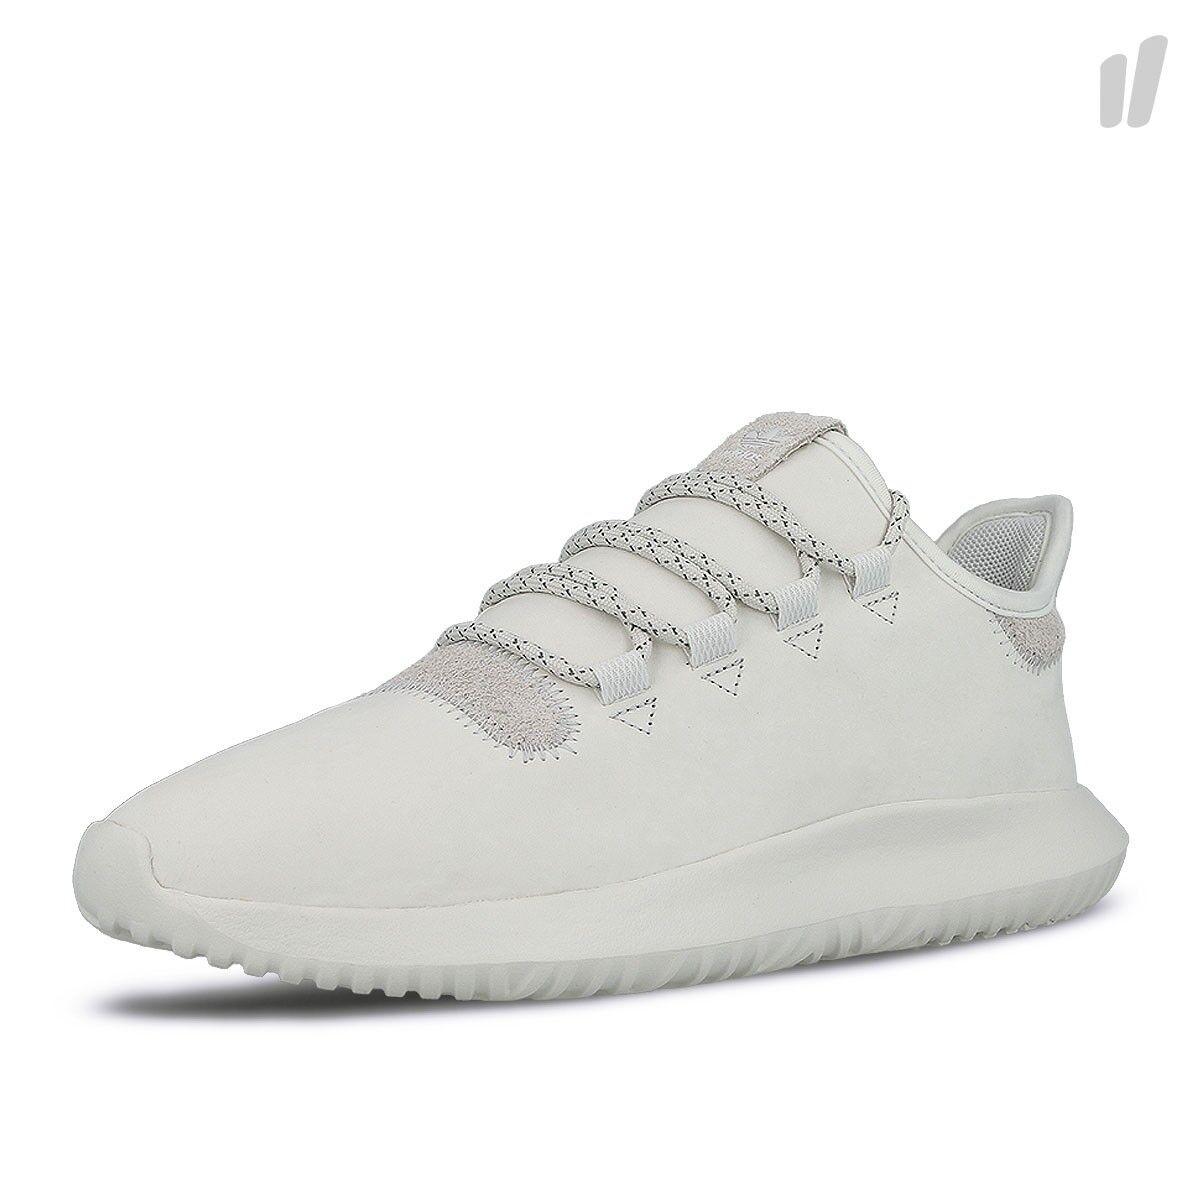 Adidas triplo white nmd r1 dimensioni noi 111399